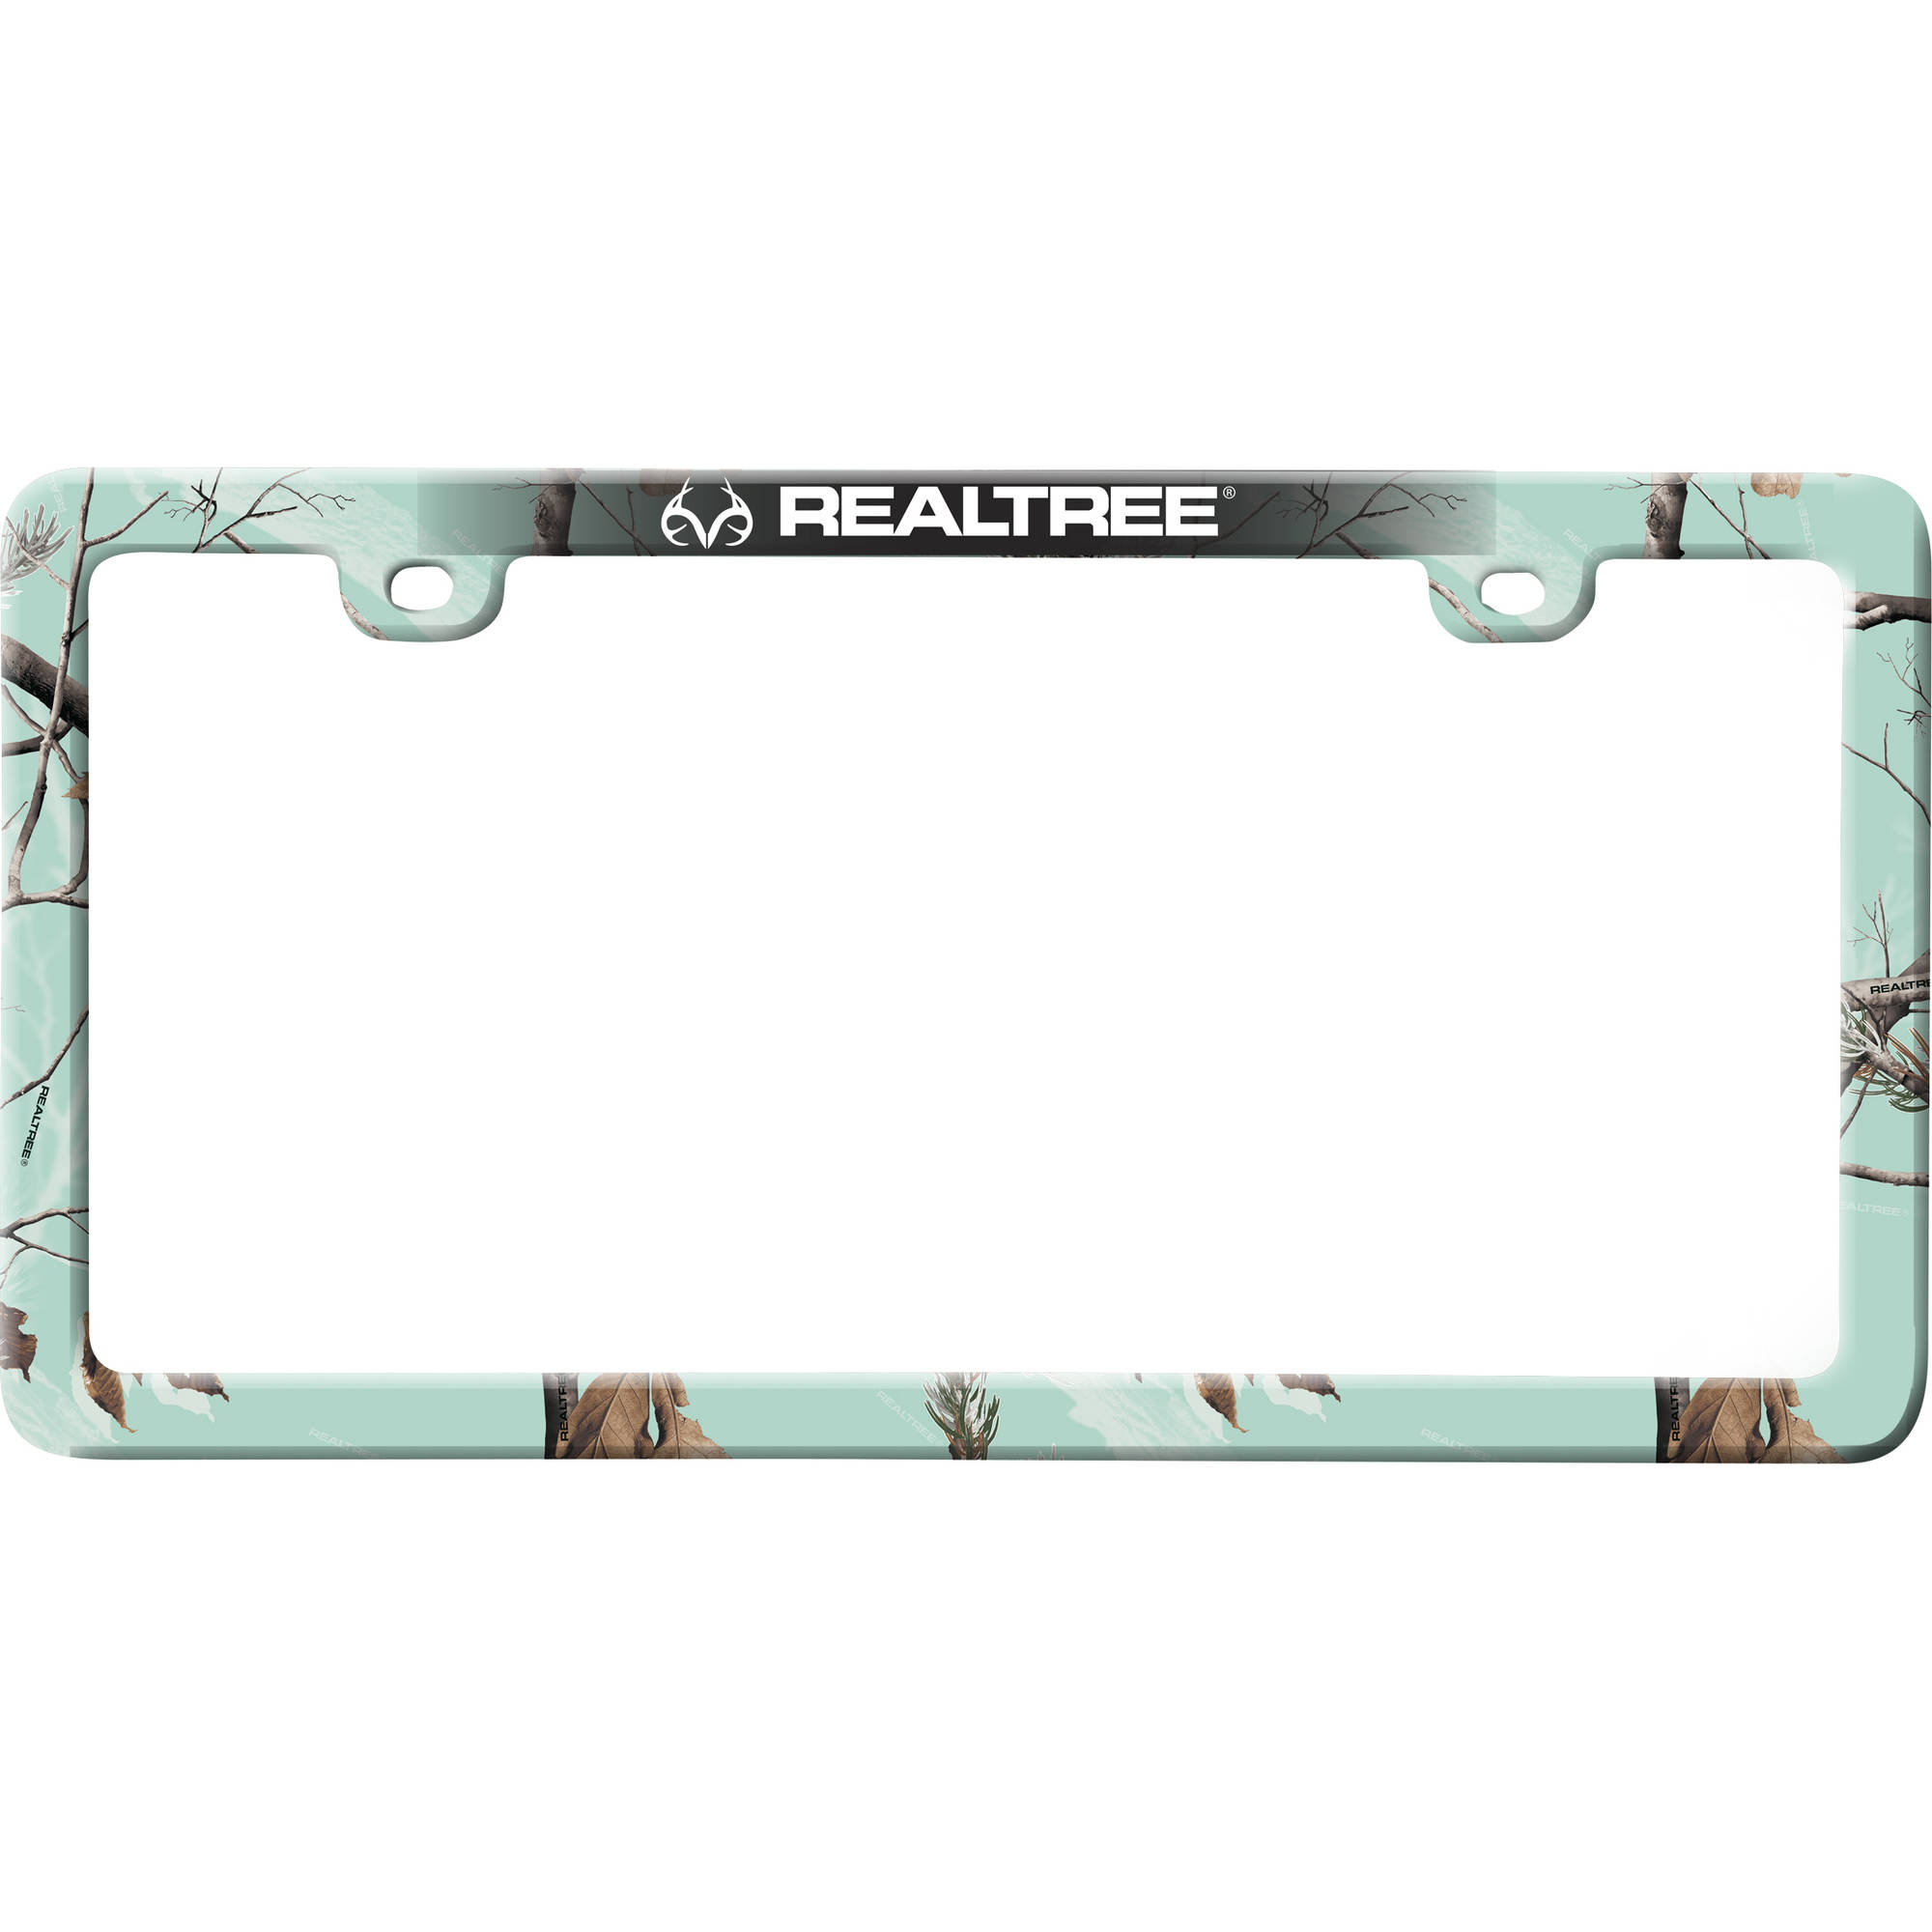 Realtree APC Mint Camouflage License Plate Frame - Walmart.com